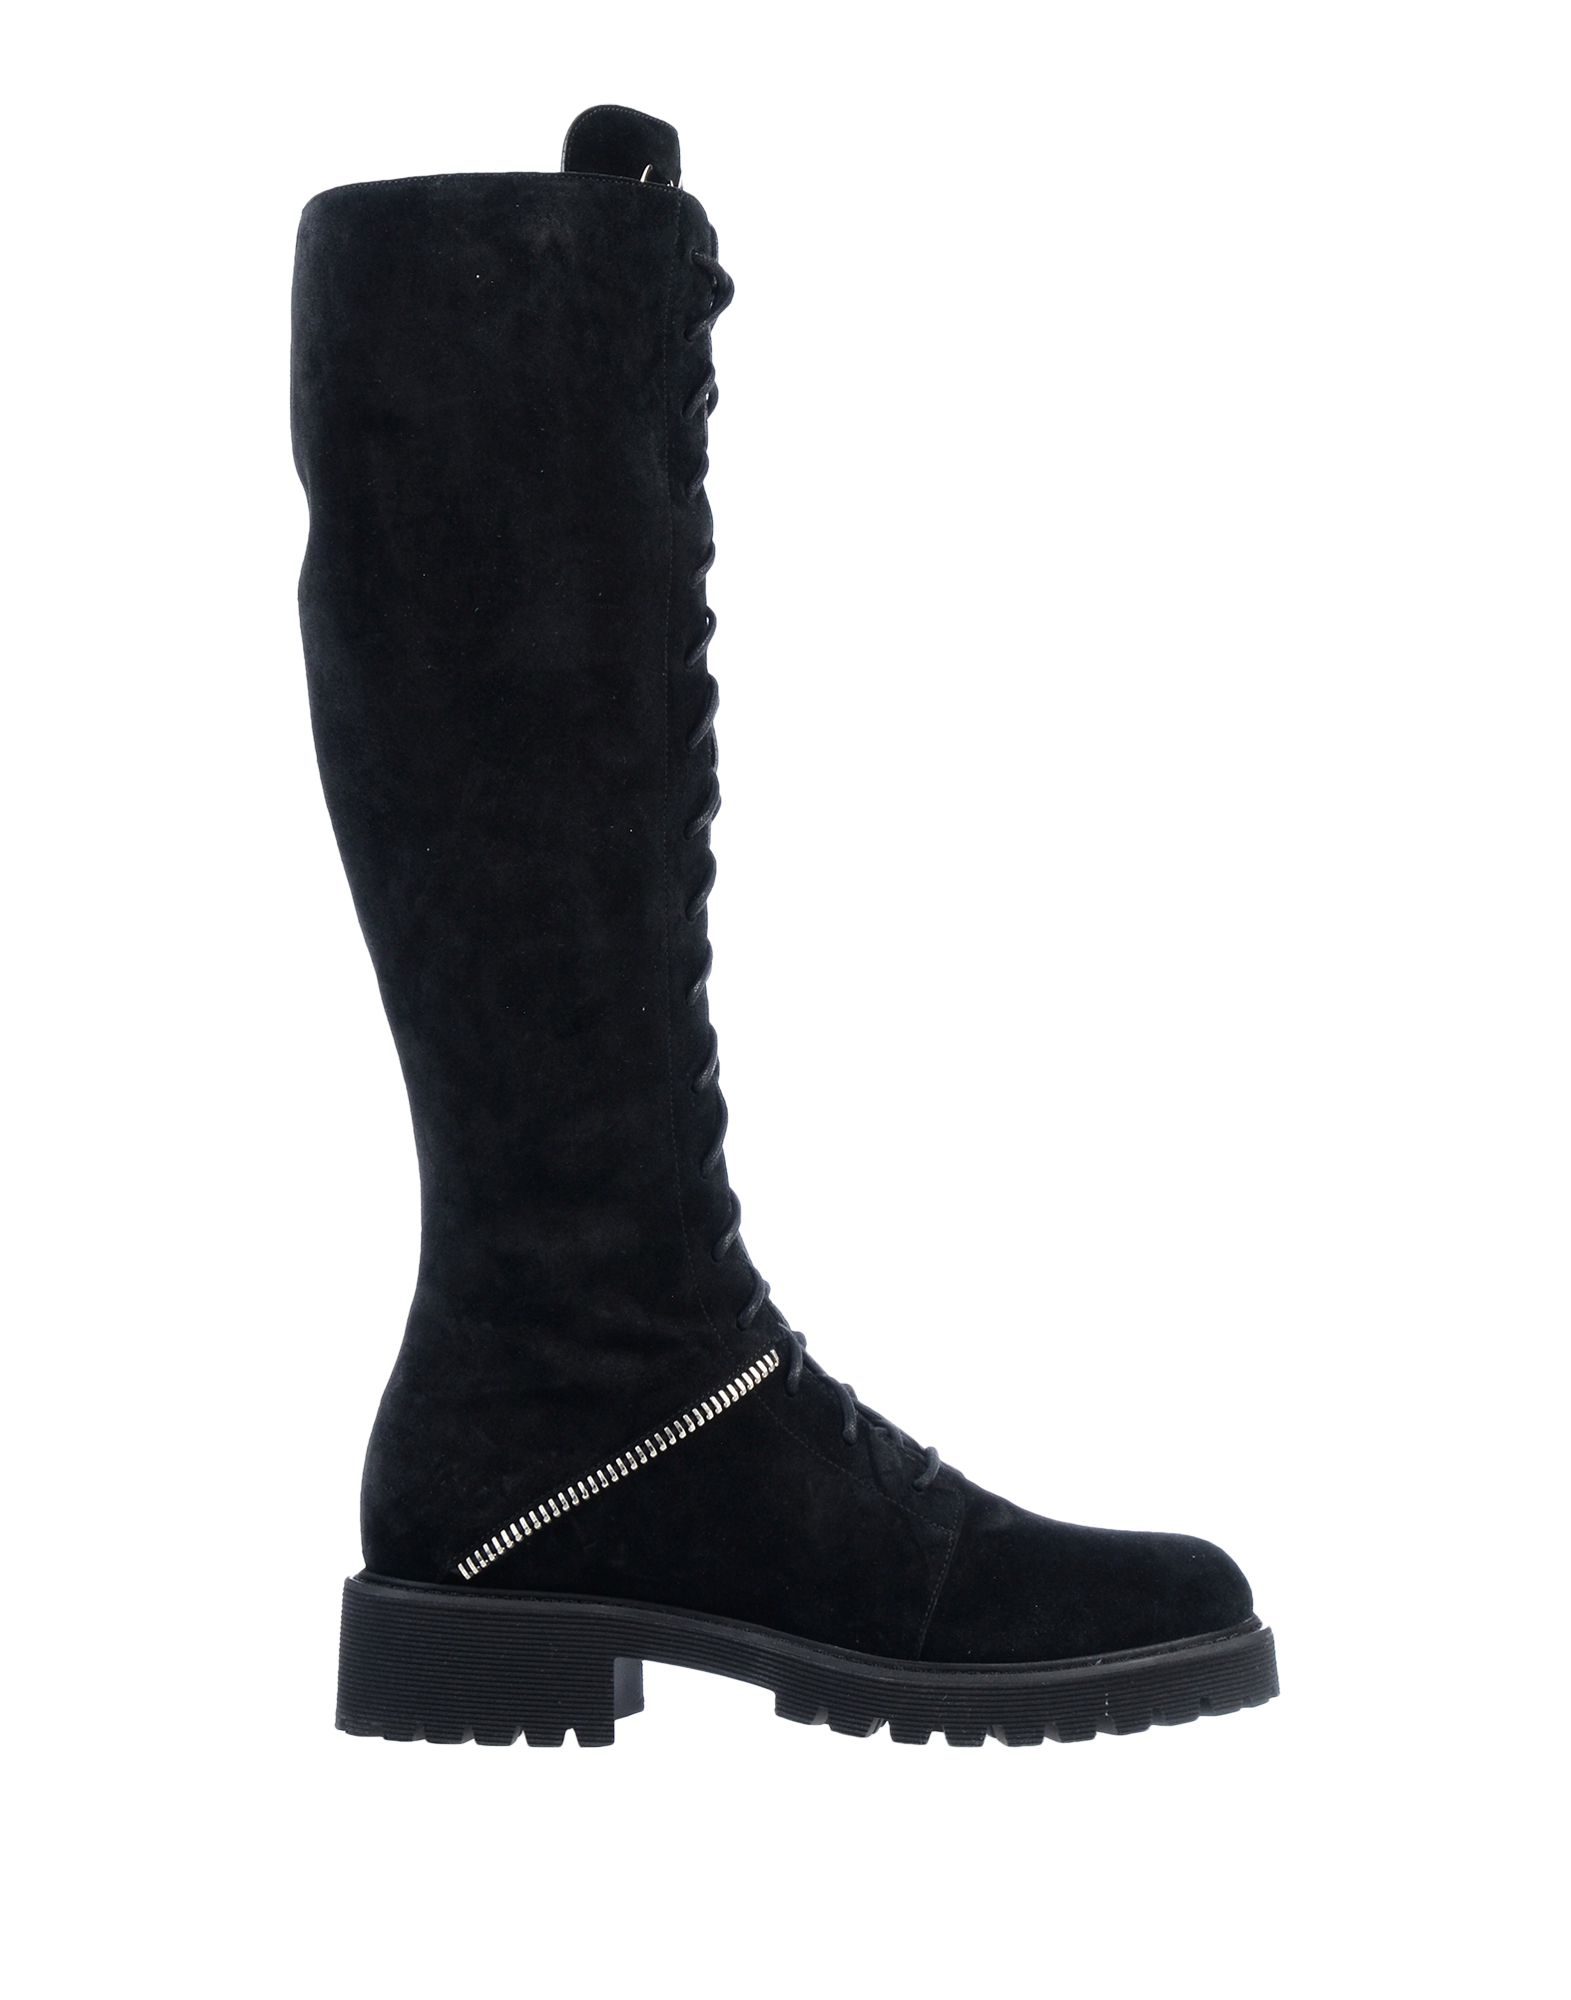 Stiefel Giuseppe Zanotti damen - 11704962MS